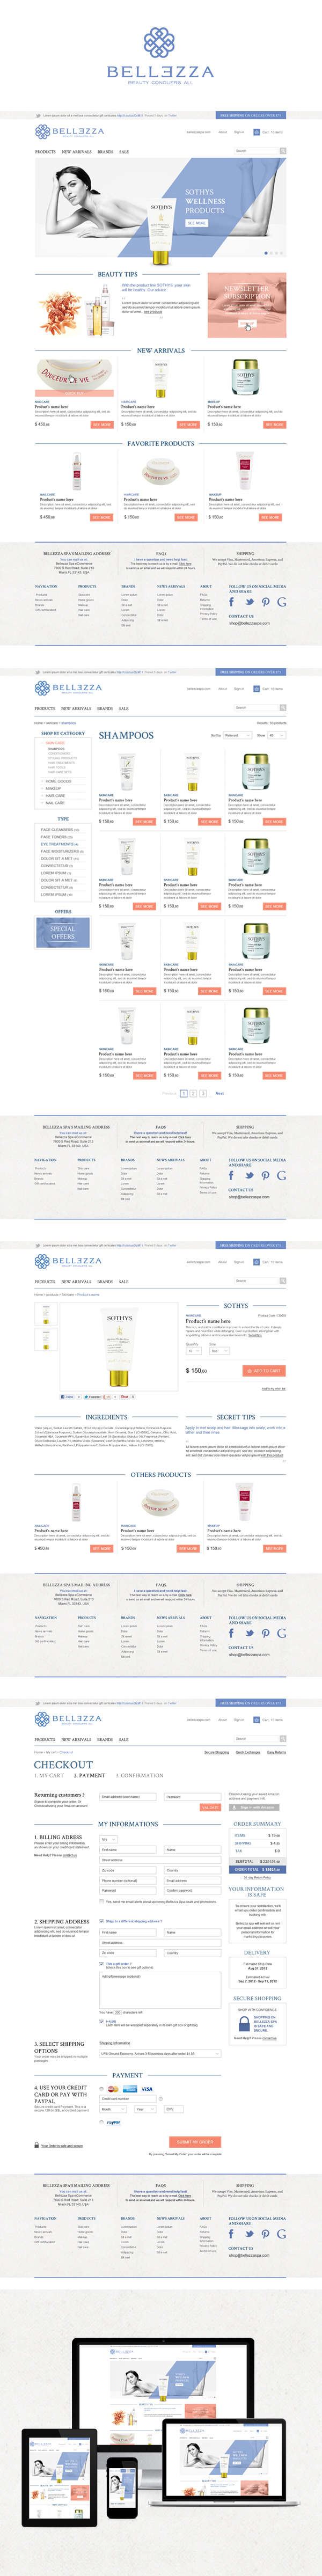 Bellezzas Responsive E Commerce By Jeremy Husser Via Behance Dengan Gambar